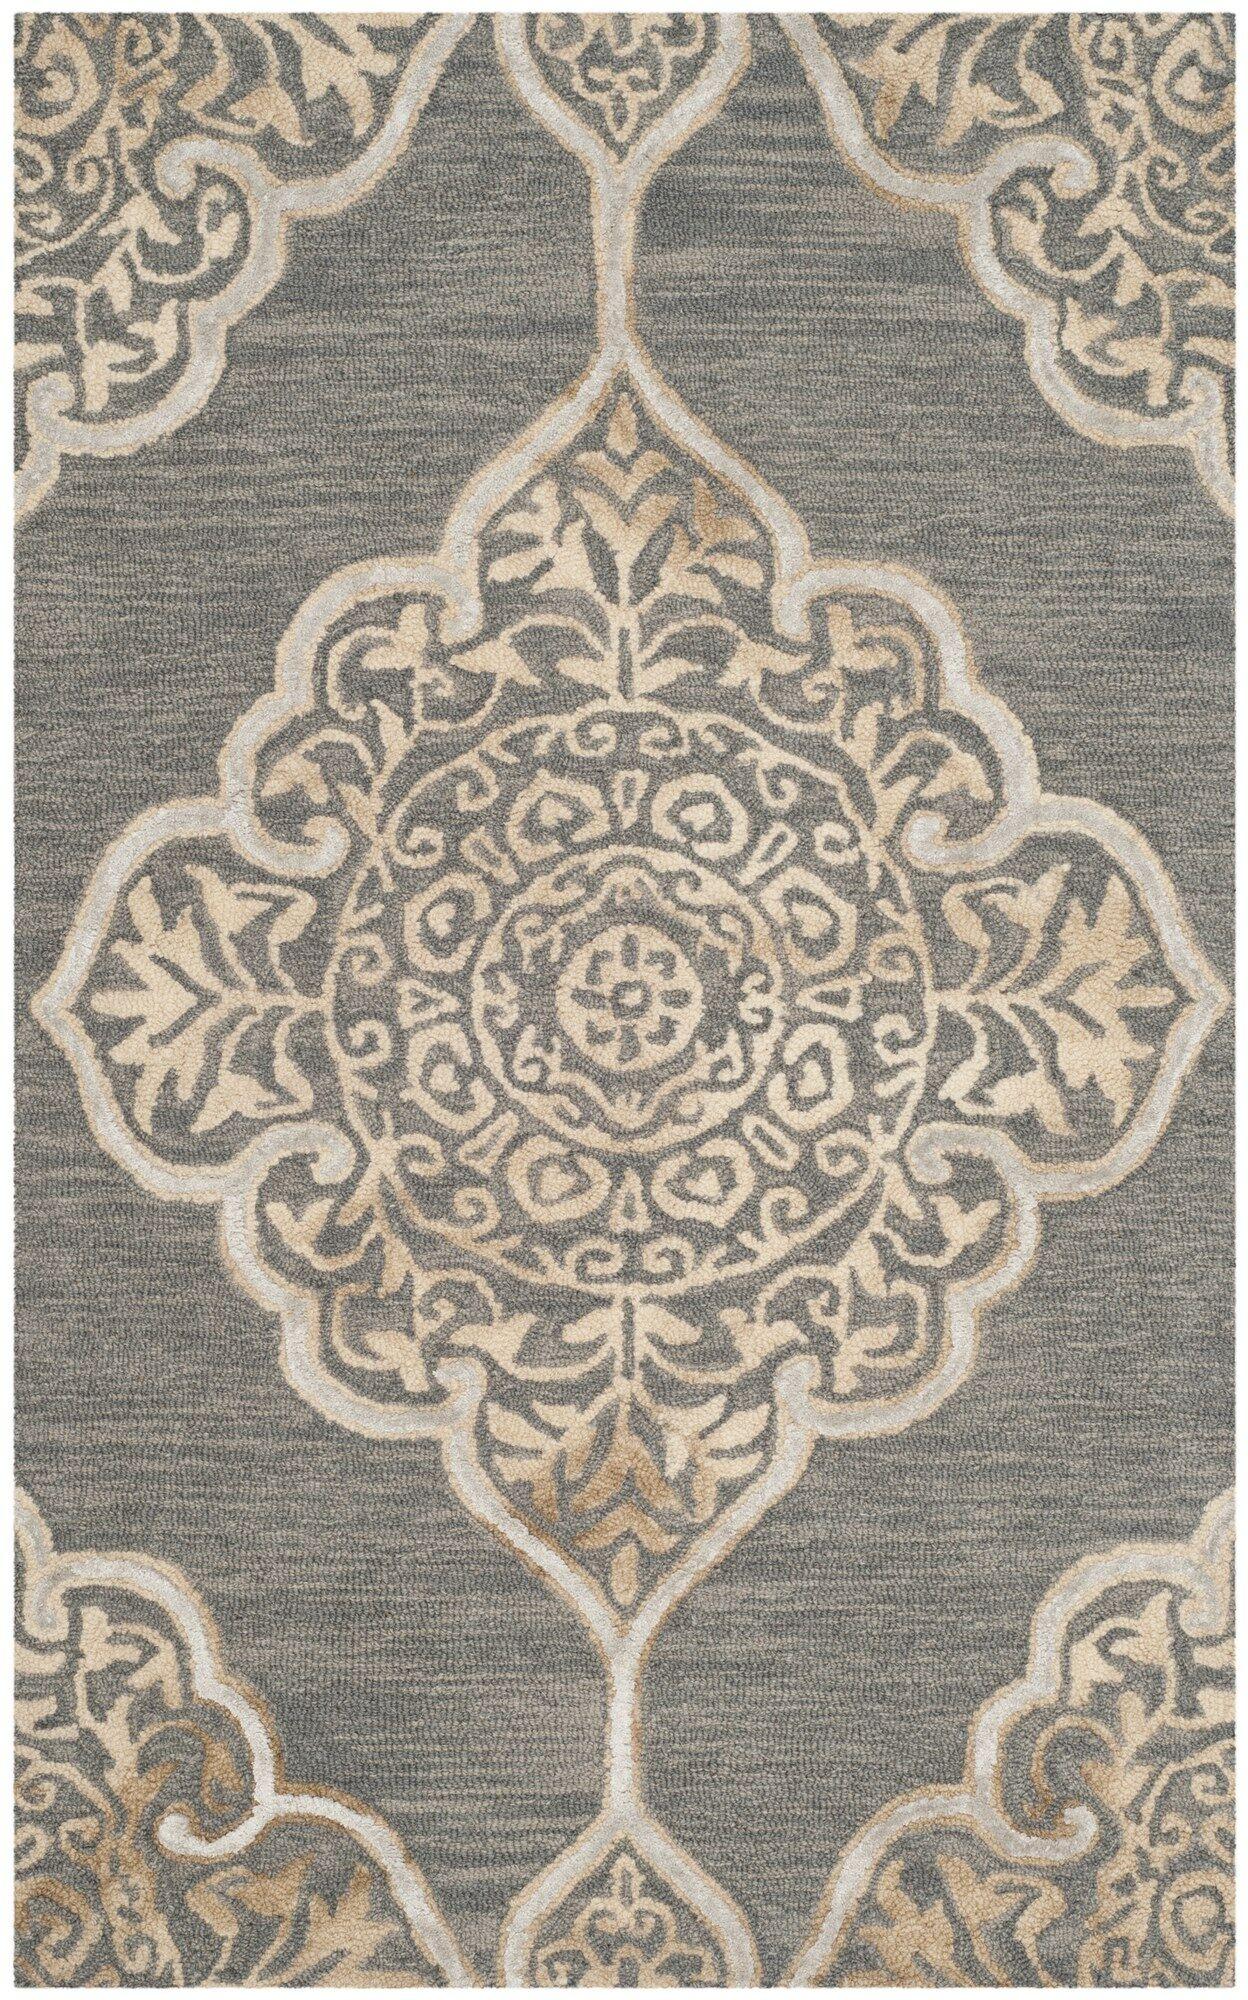 Brennan Hand-Tufted Wool Slate Area Rug Rug Size: Rectangle 3' x 5'